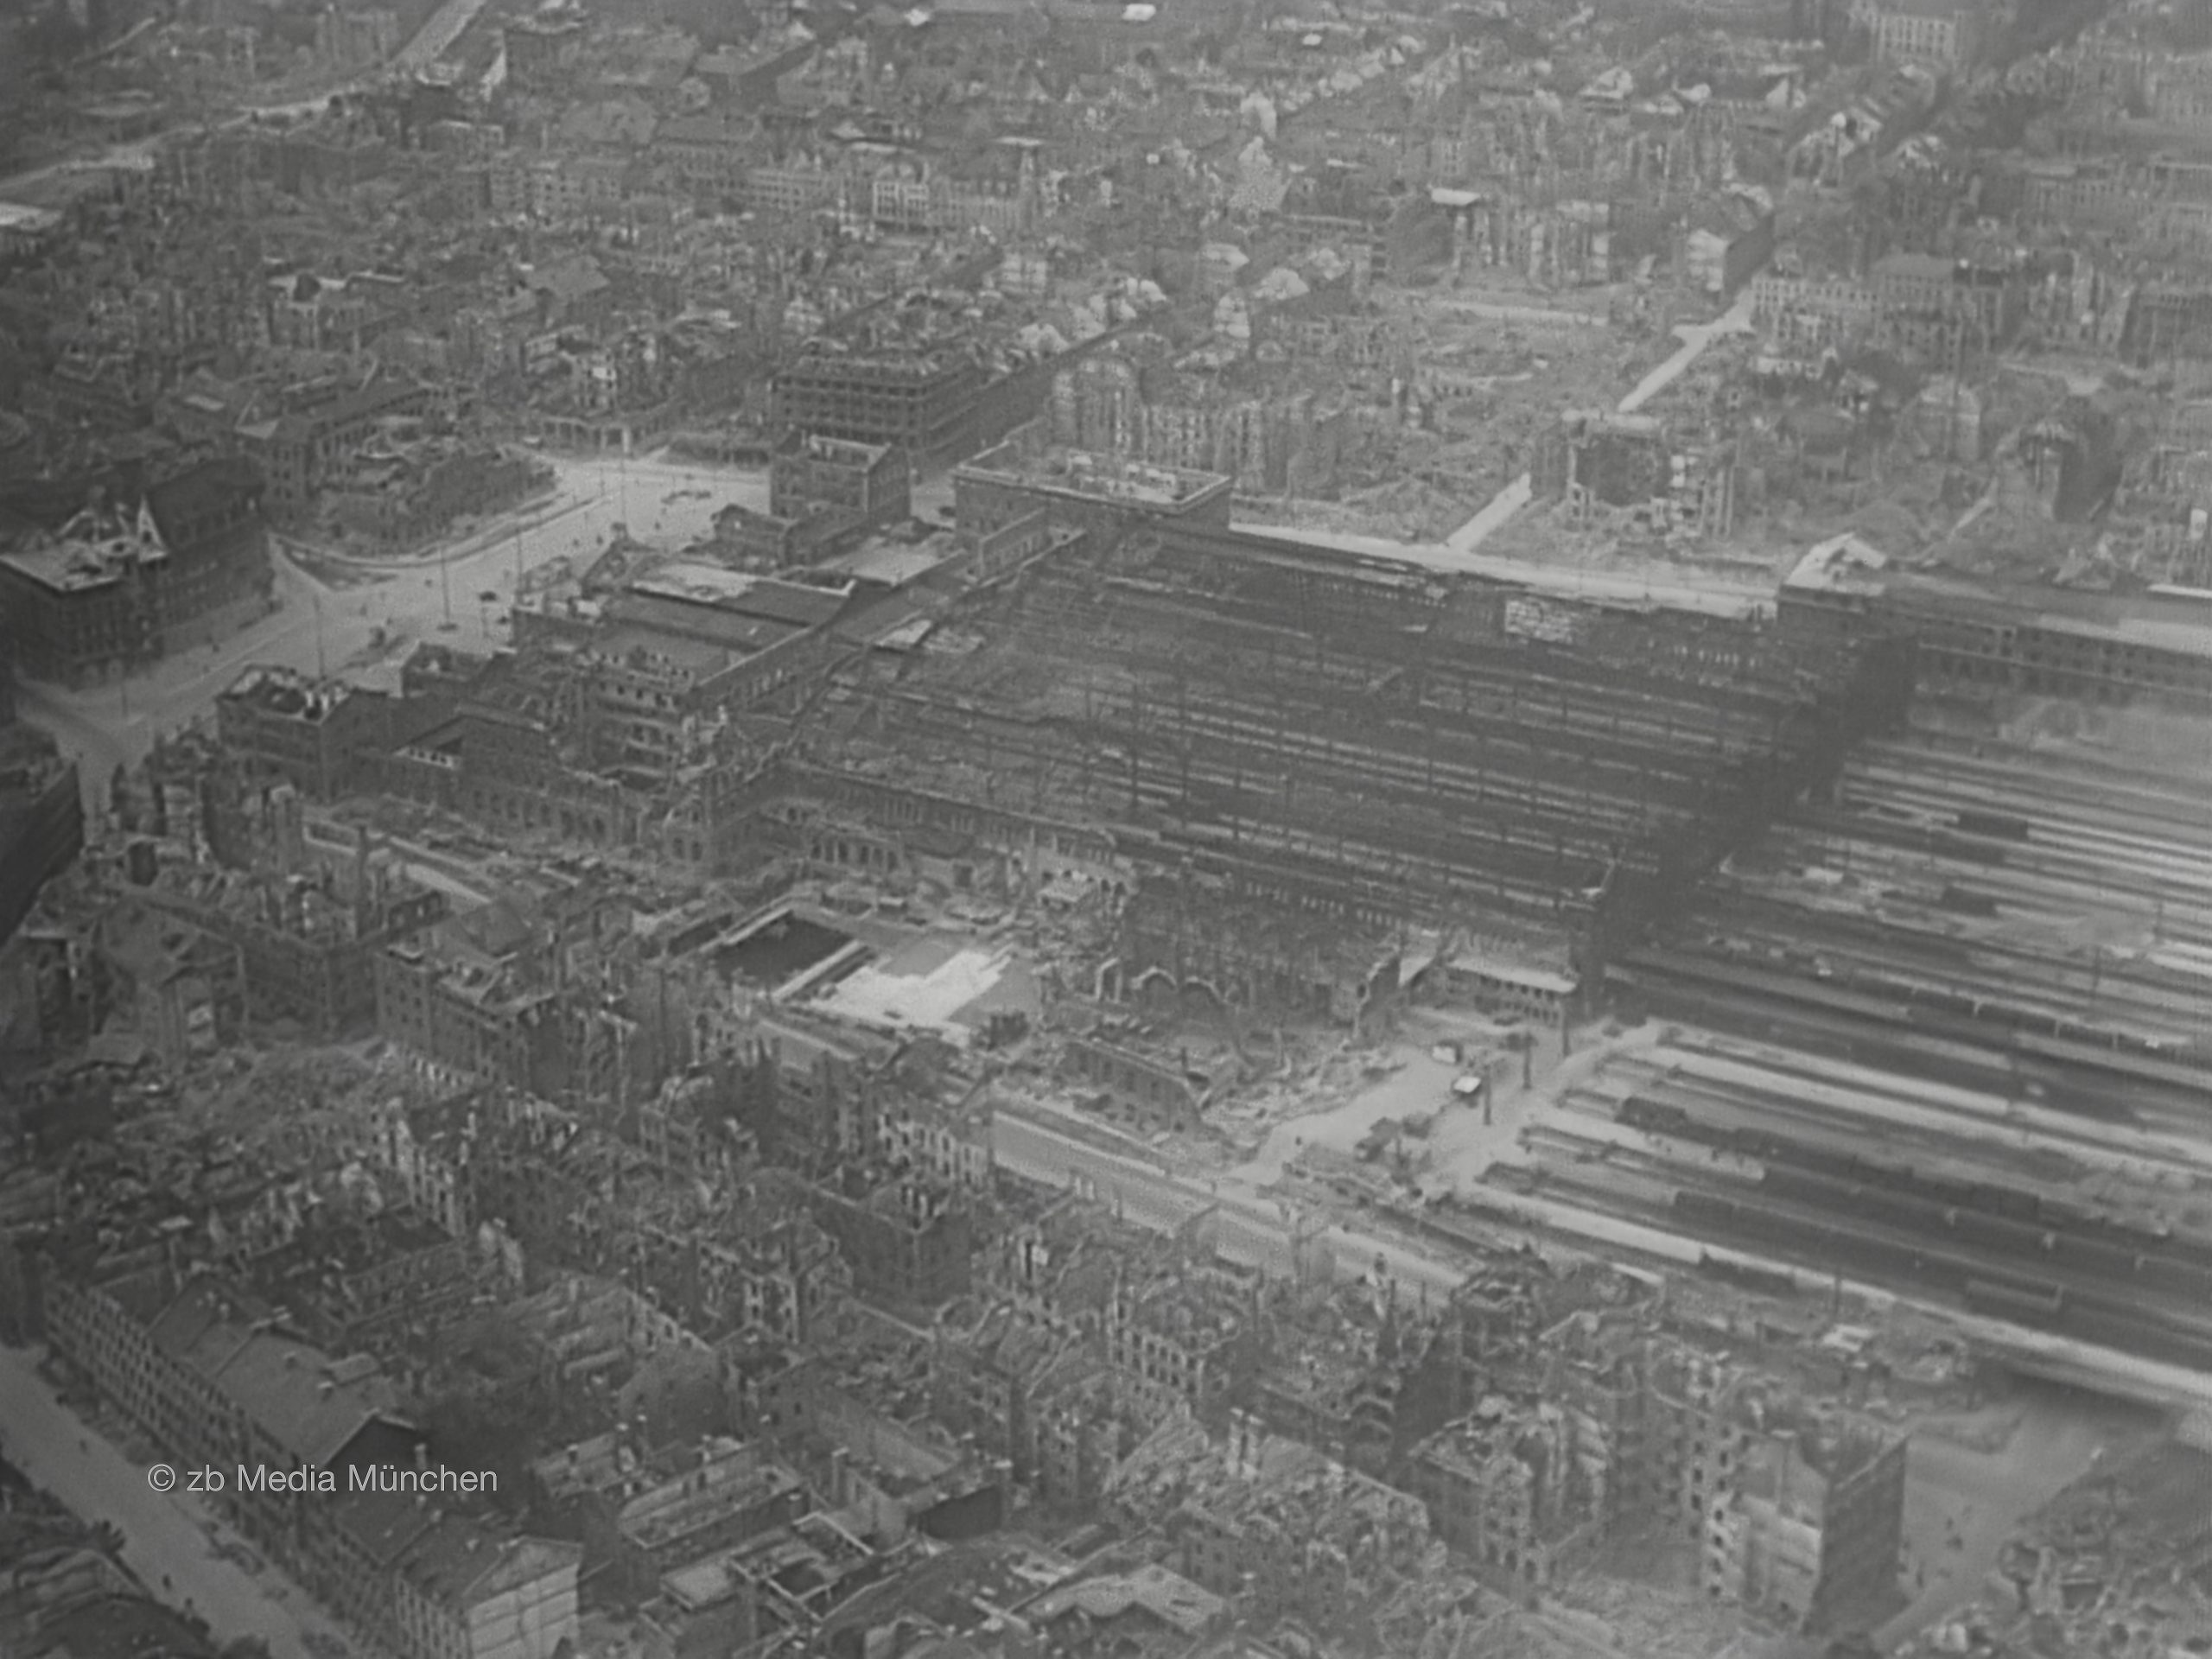 Flugaufnahme Ruinen Hauptbahnhof München 30. April 1945